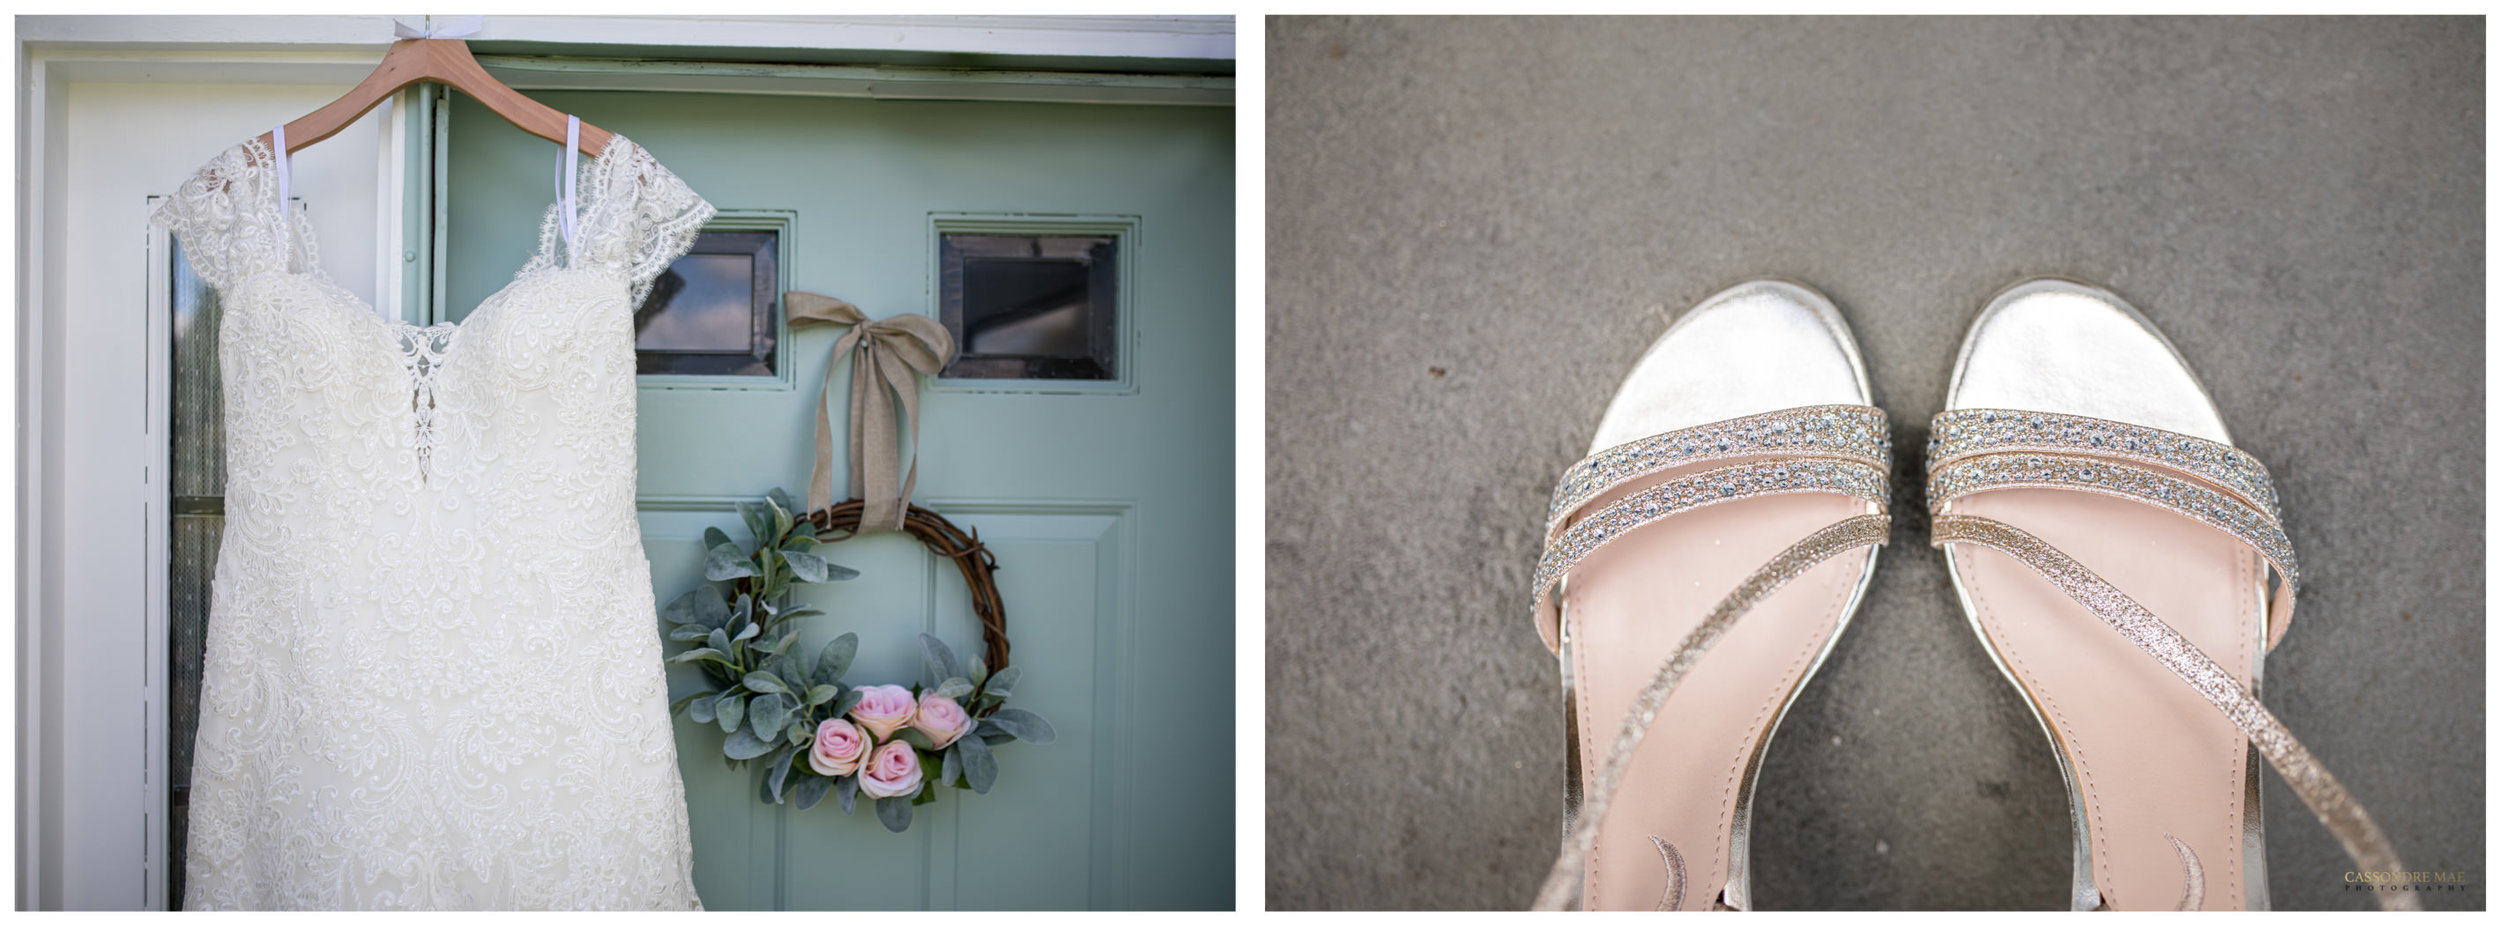 Cassondre Mae Photography The Links Wedding Photographer 3.jpg